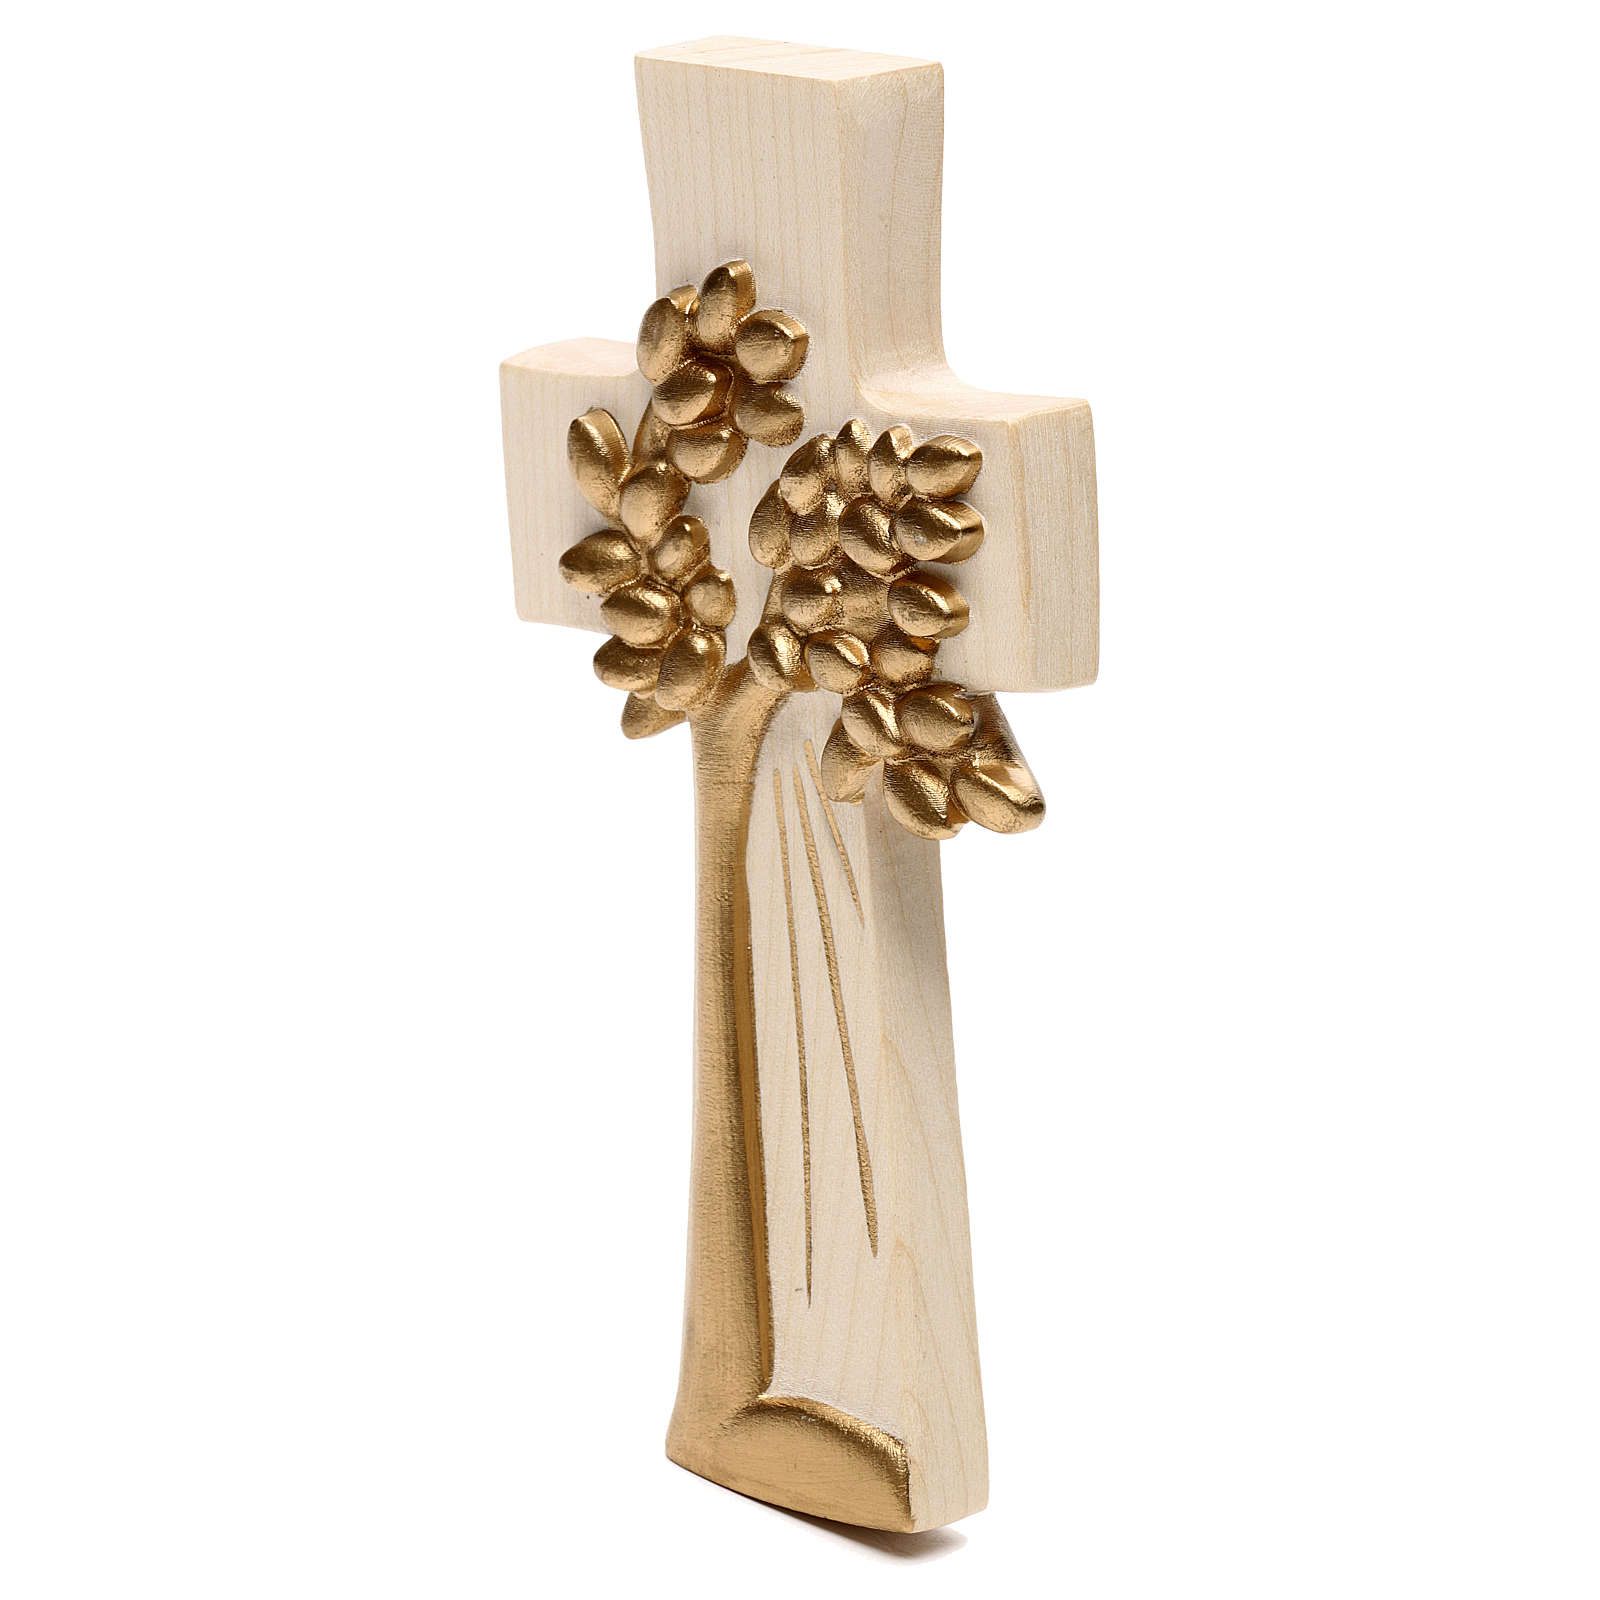 Croix Arbre de Vie Ambiente Design bois Val Gardena ciré fil or 4